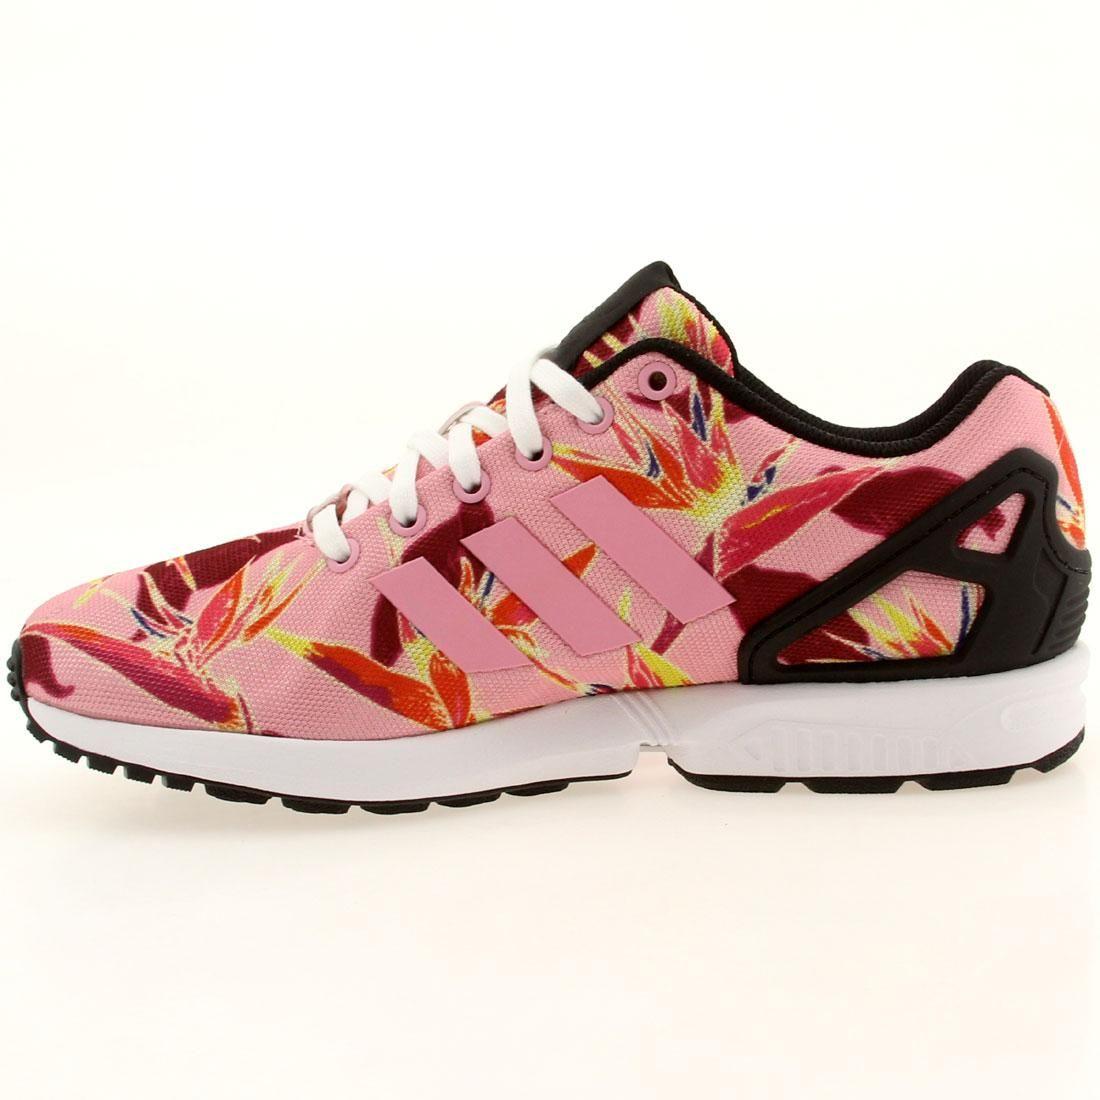 Adidas Men ZX Flux - Solar Floral (pink / ltpink)